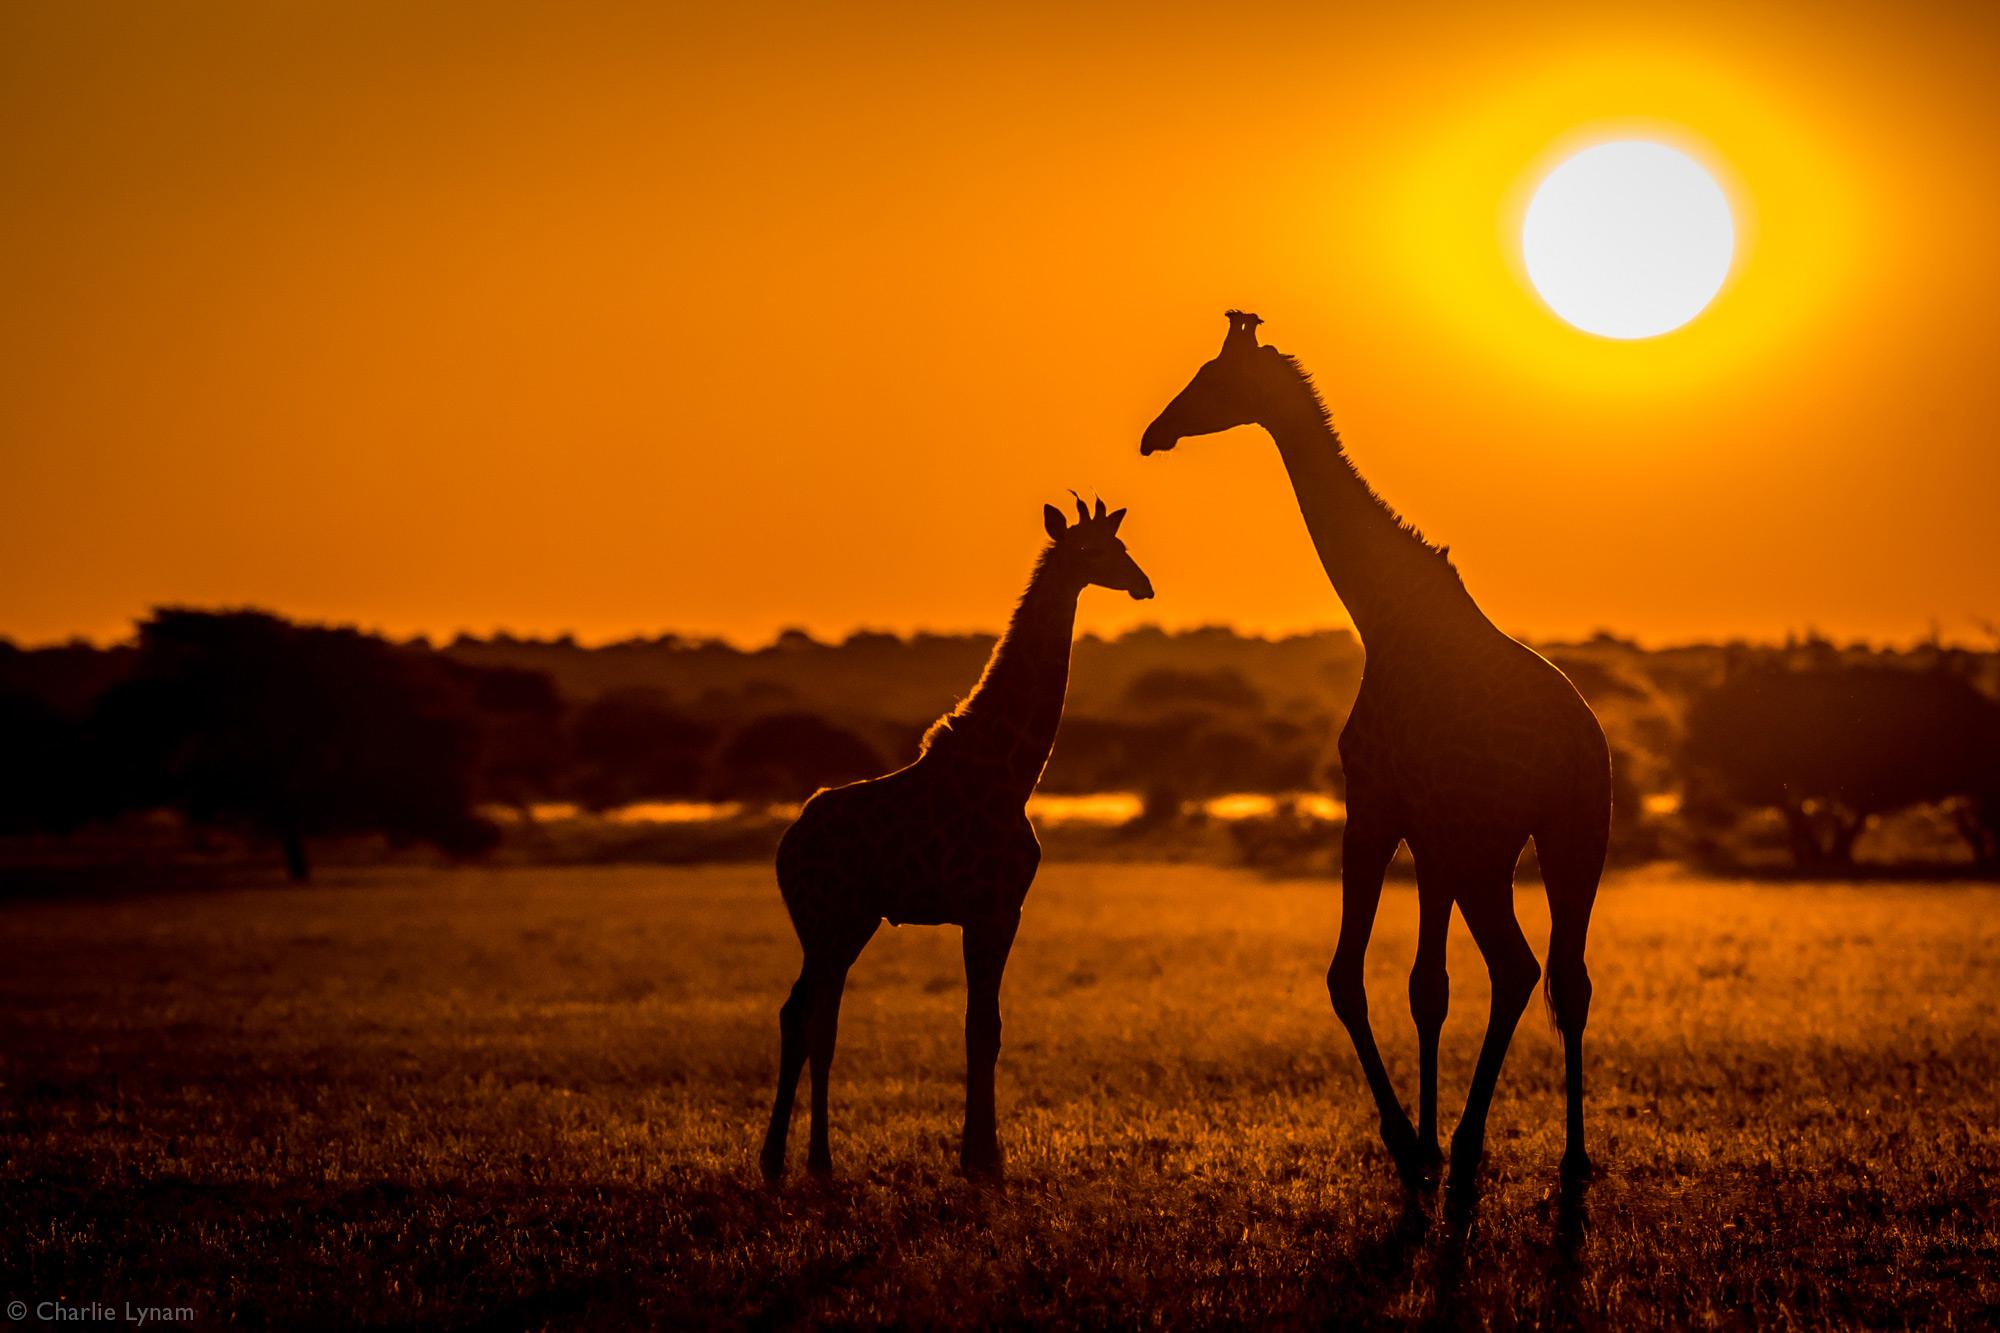 Two giraffes at sunset in Central Kalahari Game Reserve, Botswana